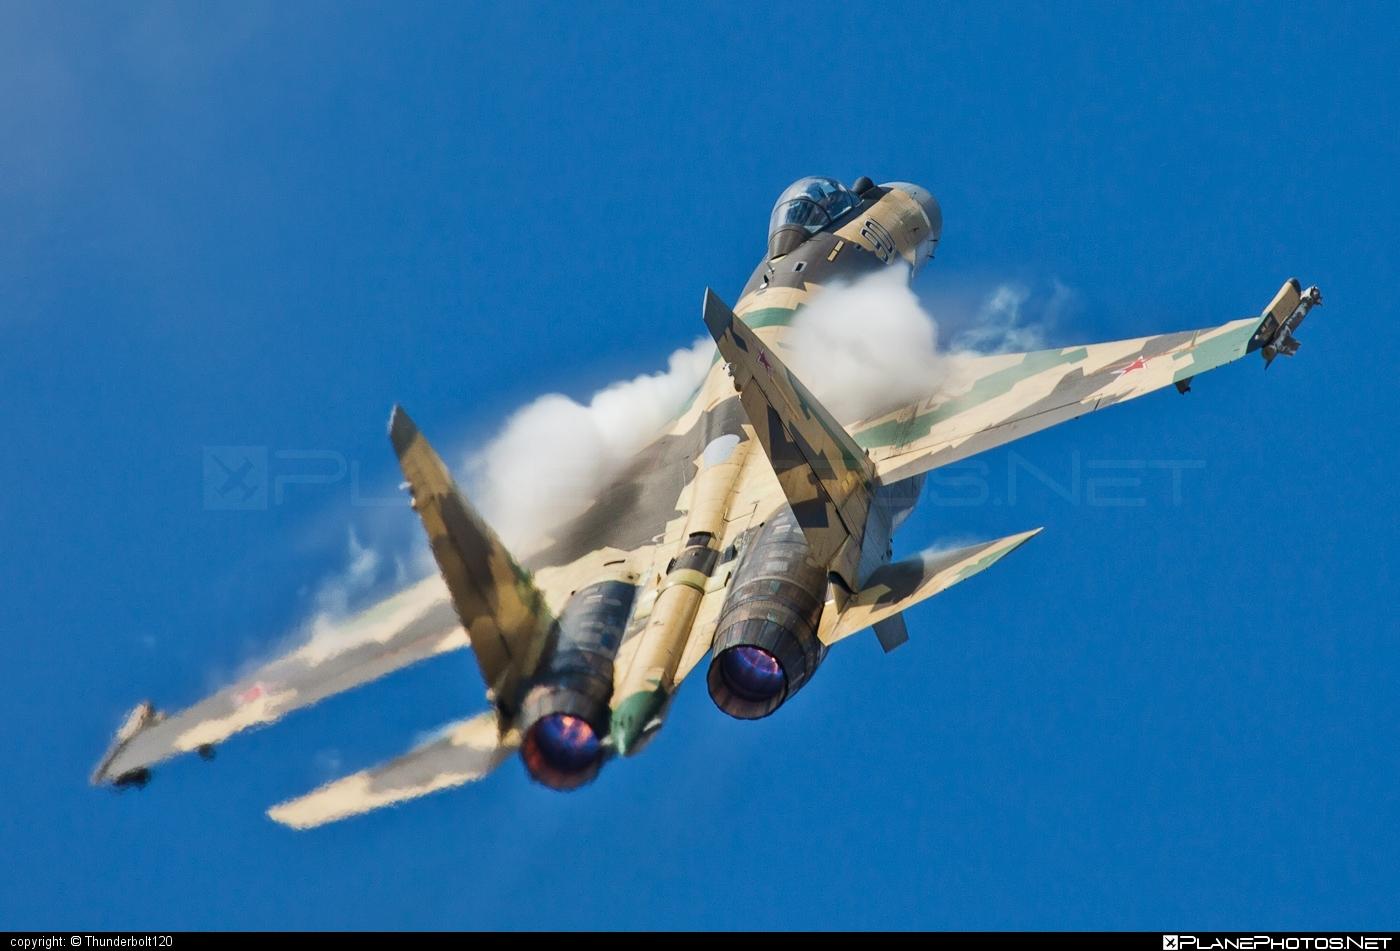 Sukhoi Su-35 - 901 operated by Voyenno-vozdushnye sily Rossii (Russian Air Force) #su35 #sukhoi #sukhoi35